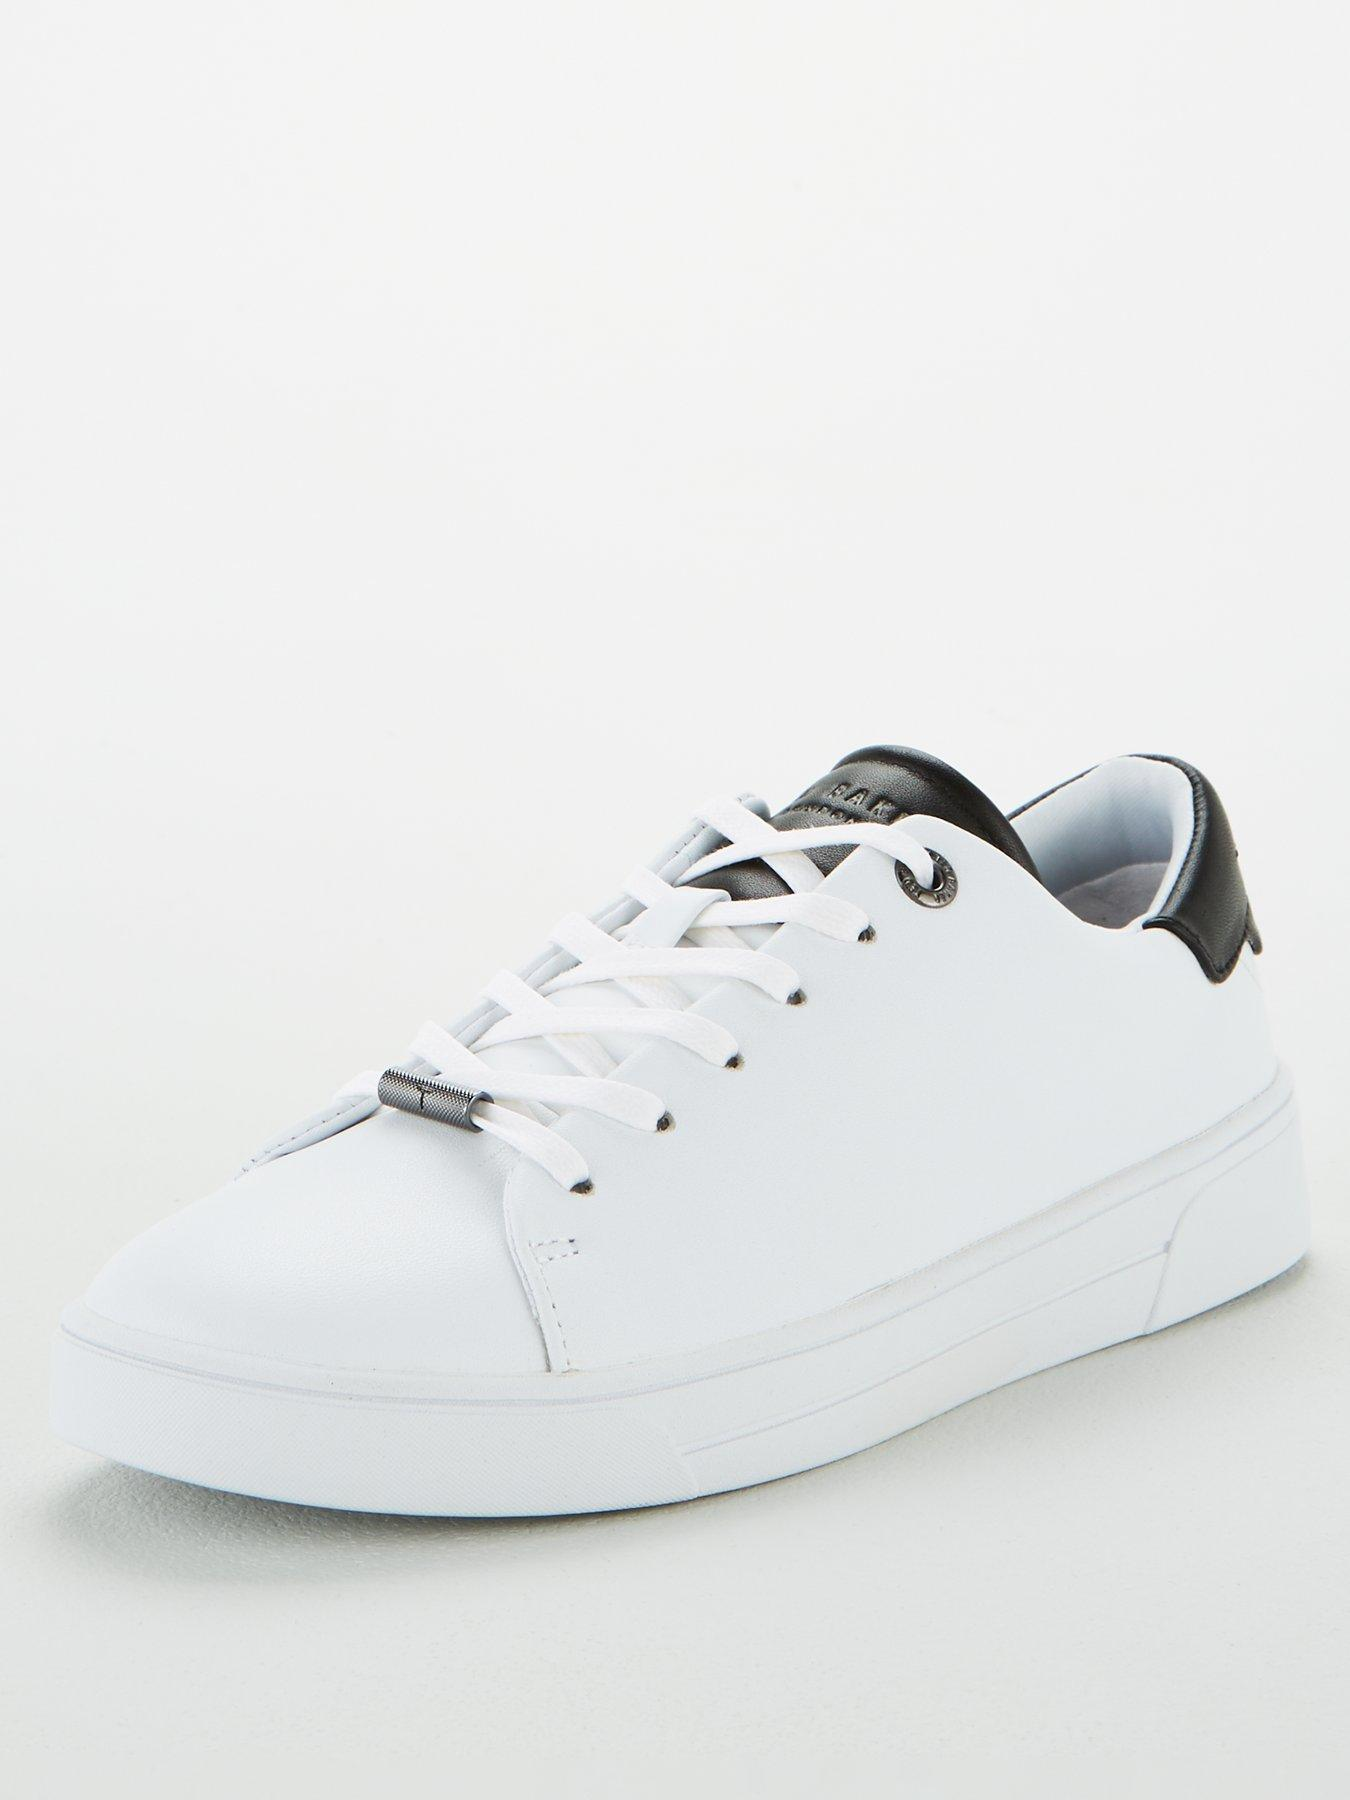 Ted baker   Flats   Shoes \u0026 boots